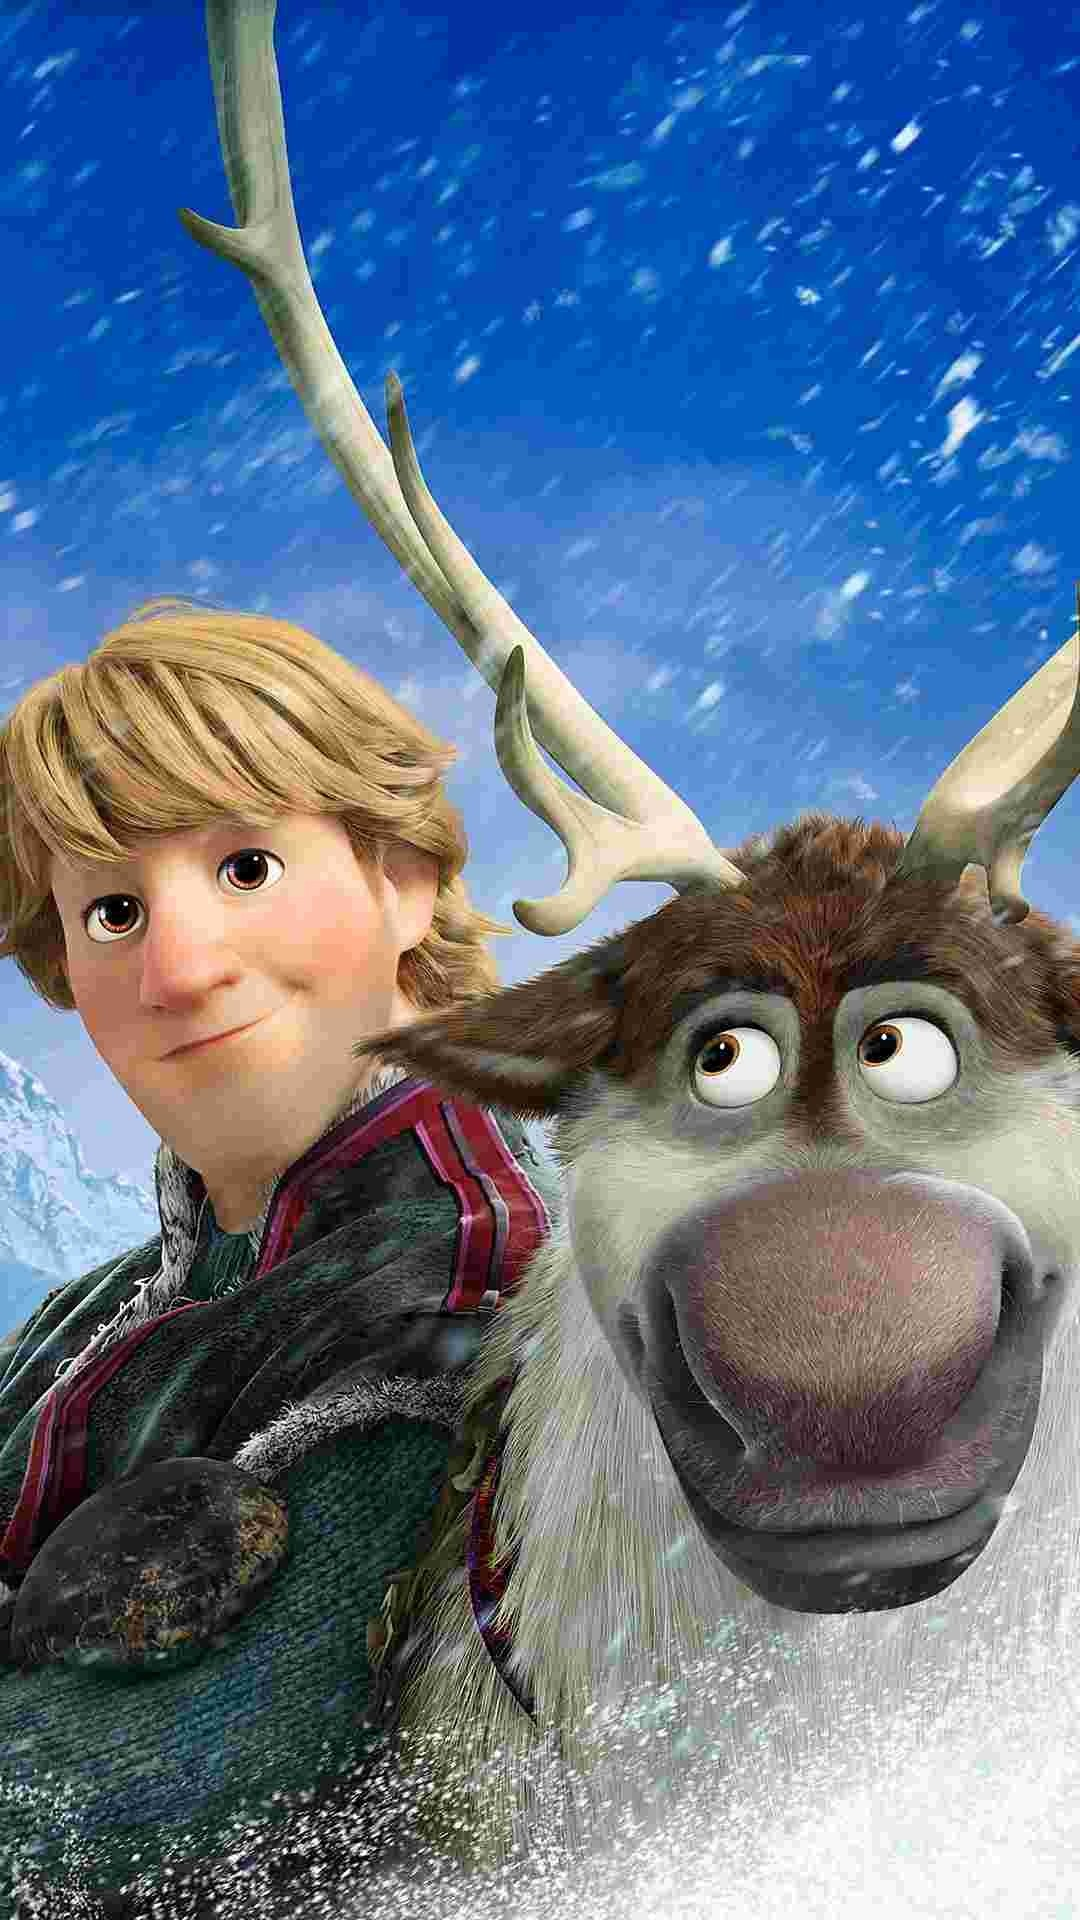 Frozen olaf wallpaper 70 images - Olaf s frozen adventure download ...